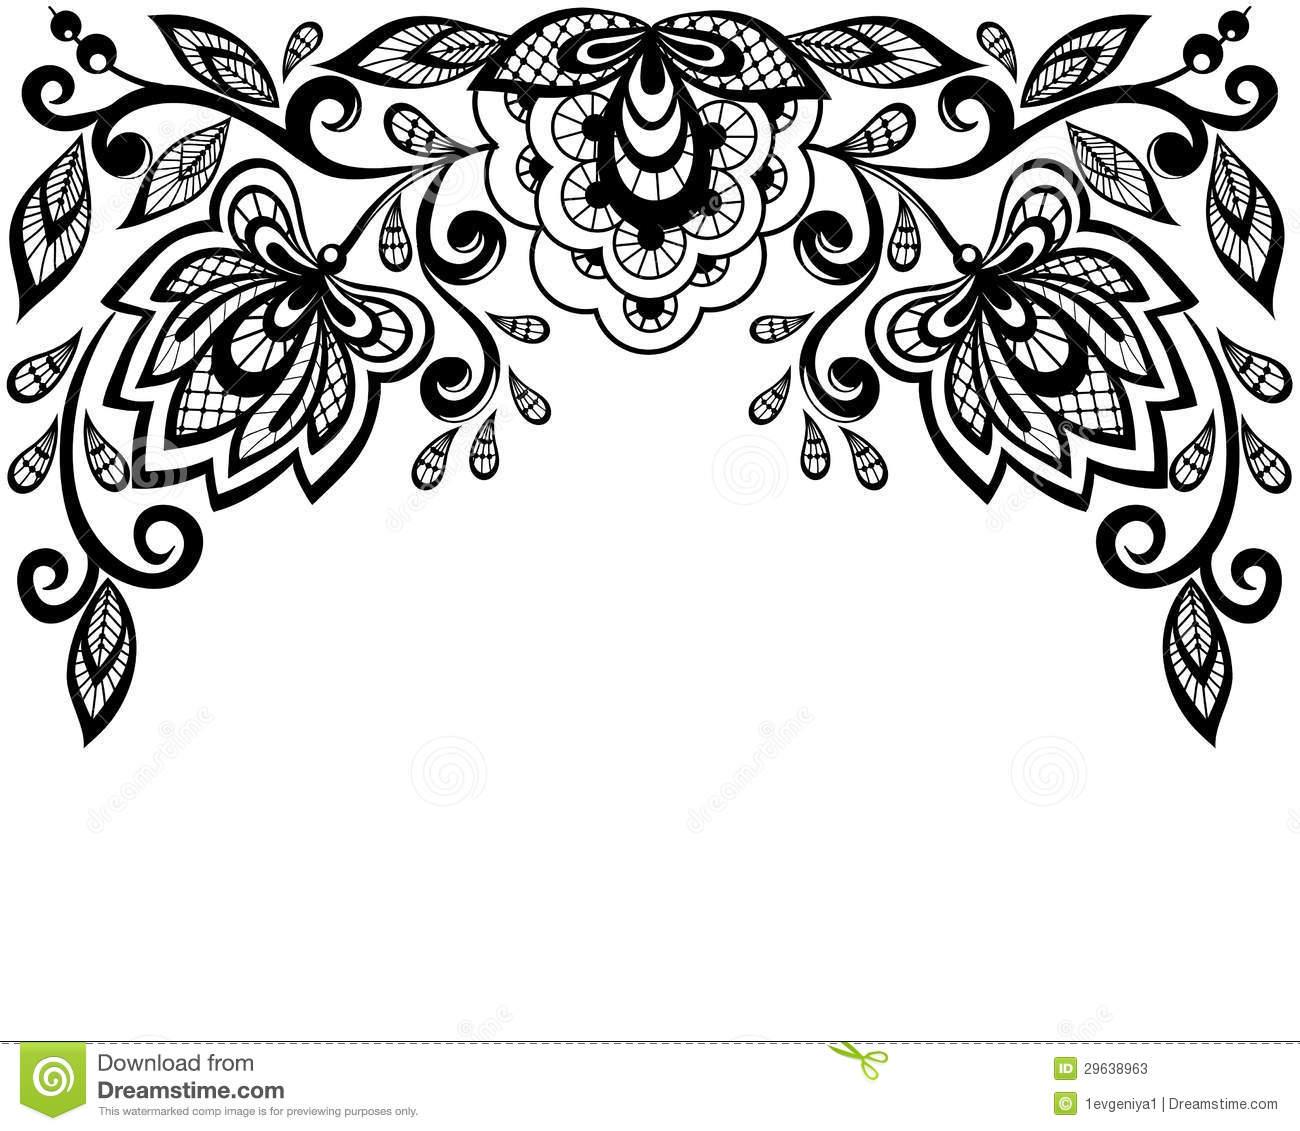 Lace Clipart - Clipart Suggest